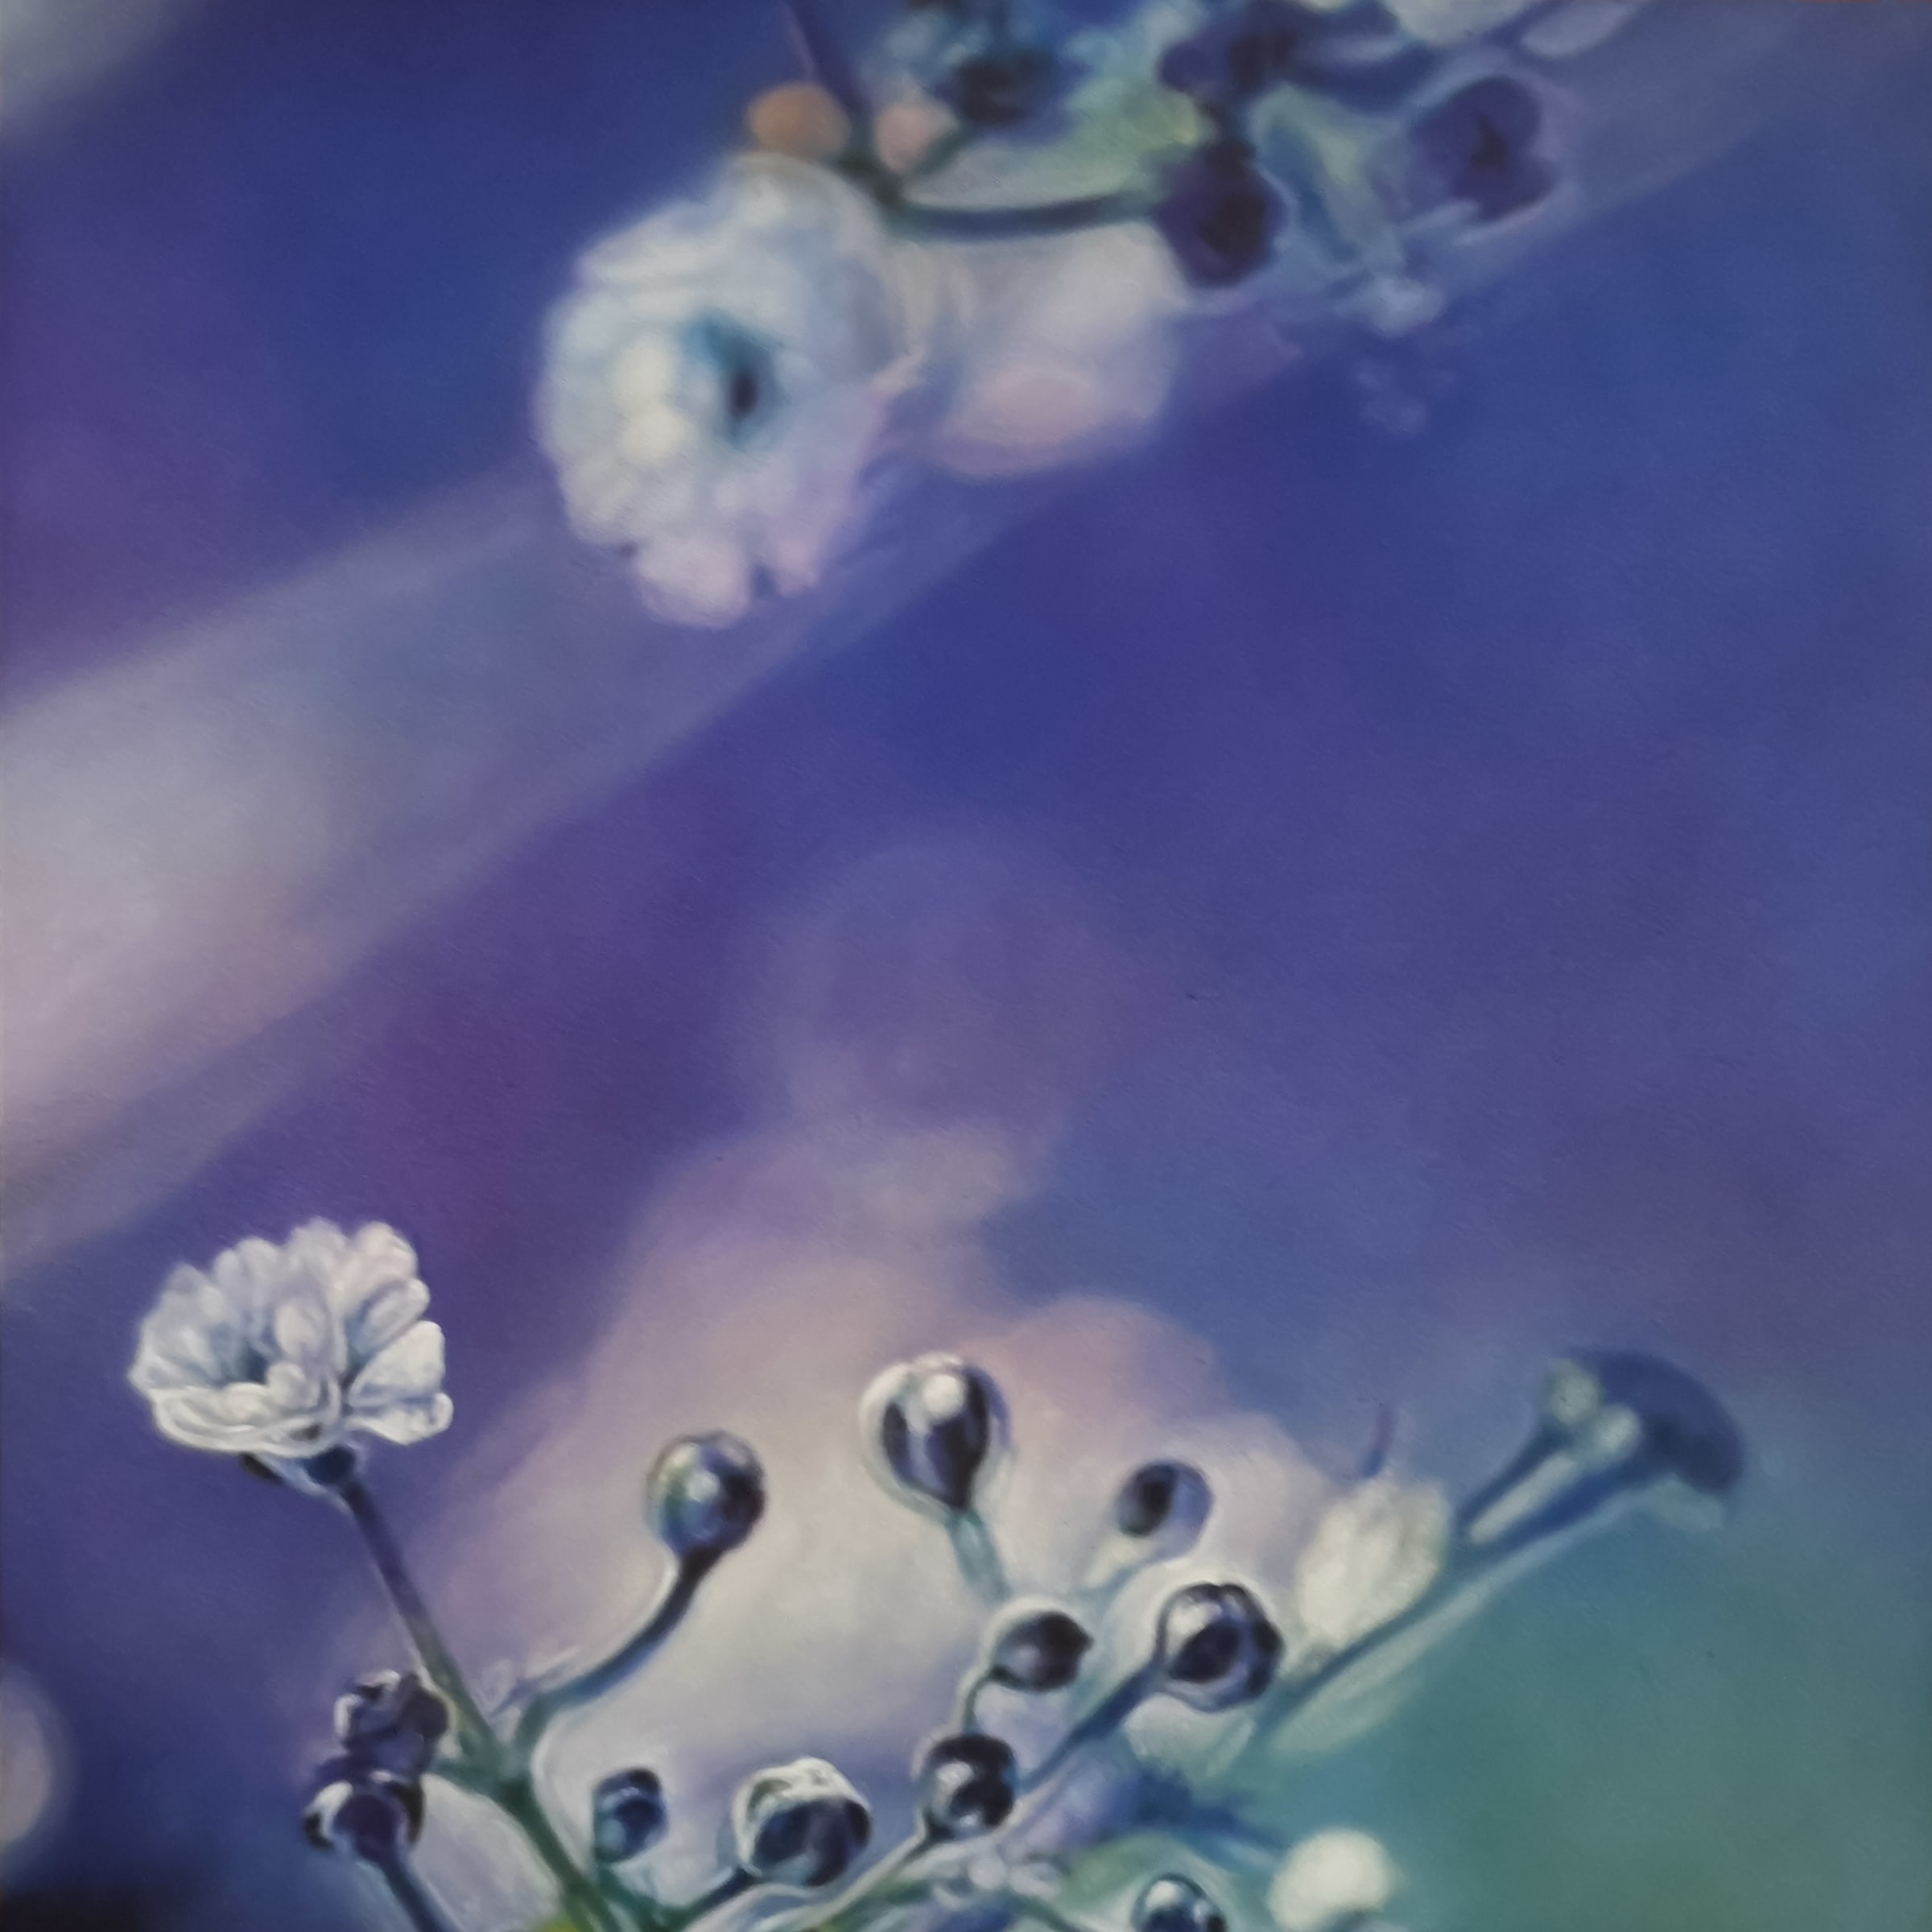 <span class=&#34;link fancybox-details-link&#34;><a href=&#34;/artists/73-sascha-%26-tashi-stylianou/works/2928-sascha-tashi-stylianou-floral-happiness-4-2018/&#34;>View Detail Page</a></span><div class=&#34;artist&#34;><strong>Sascha & Tashi Stylianou</strong></div> <div class=&#34;title&#34;><em>Floral Happiness 4</em>, 2018</div> <div class=&#34;medium&#34;>Acrylic In Brush & Spray On Canvas</div> <div class=&#34;dimensions&#34;>100cm x 100cm</div><div class=&#34;price&#34;>R10,000.00</div>